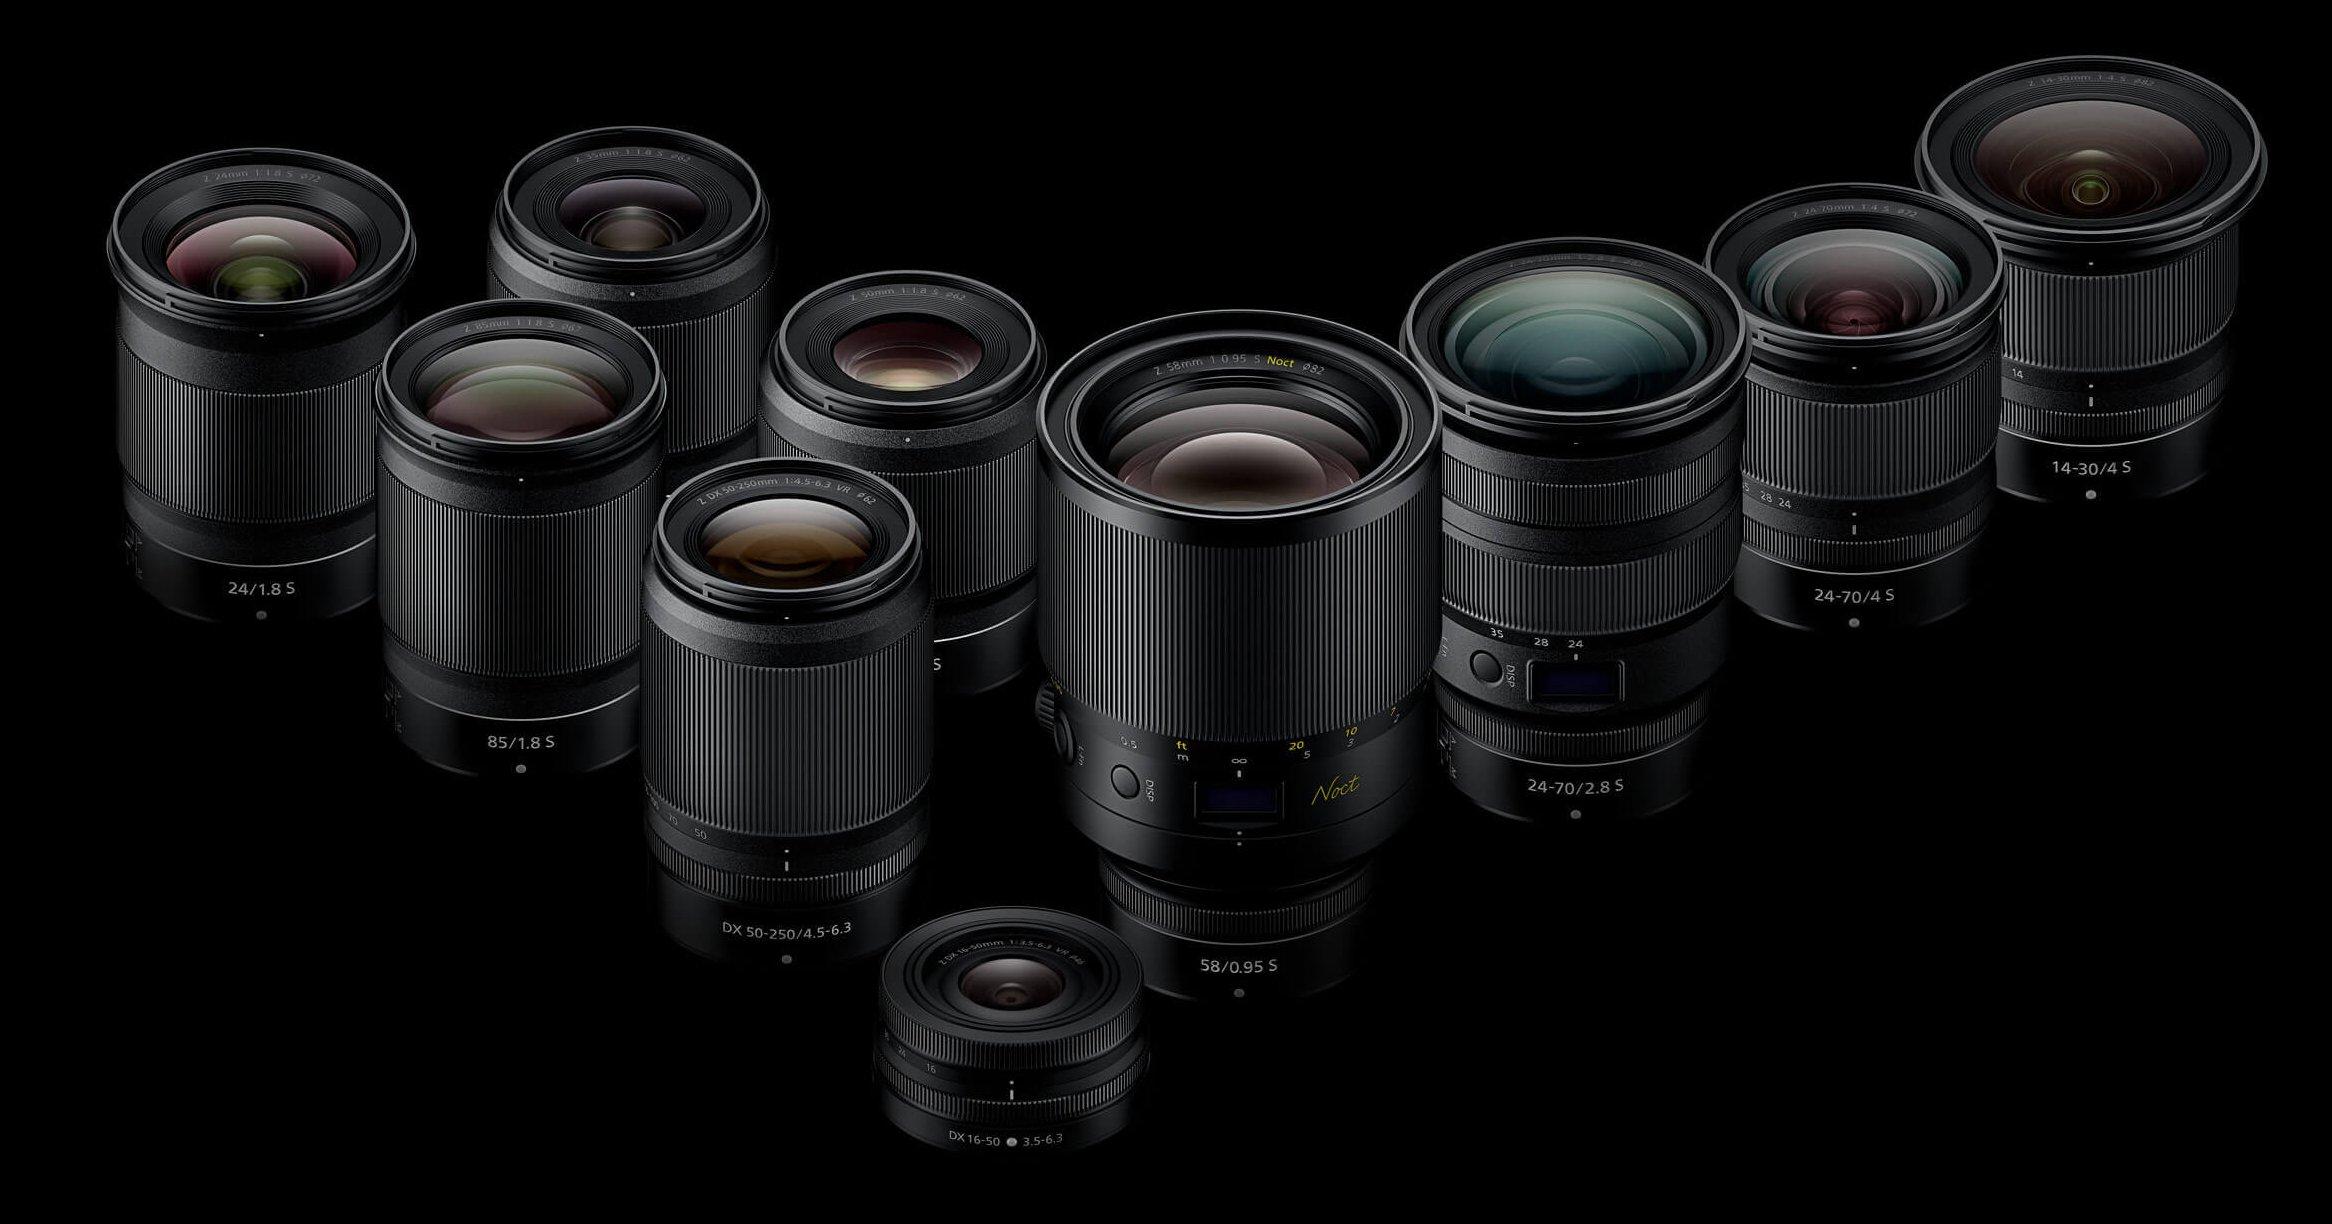 Nikon Reveals Updated Z-Mount Lens Roadmap with Nine New Lenses